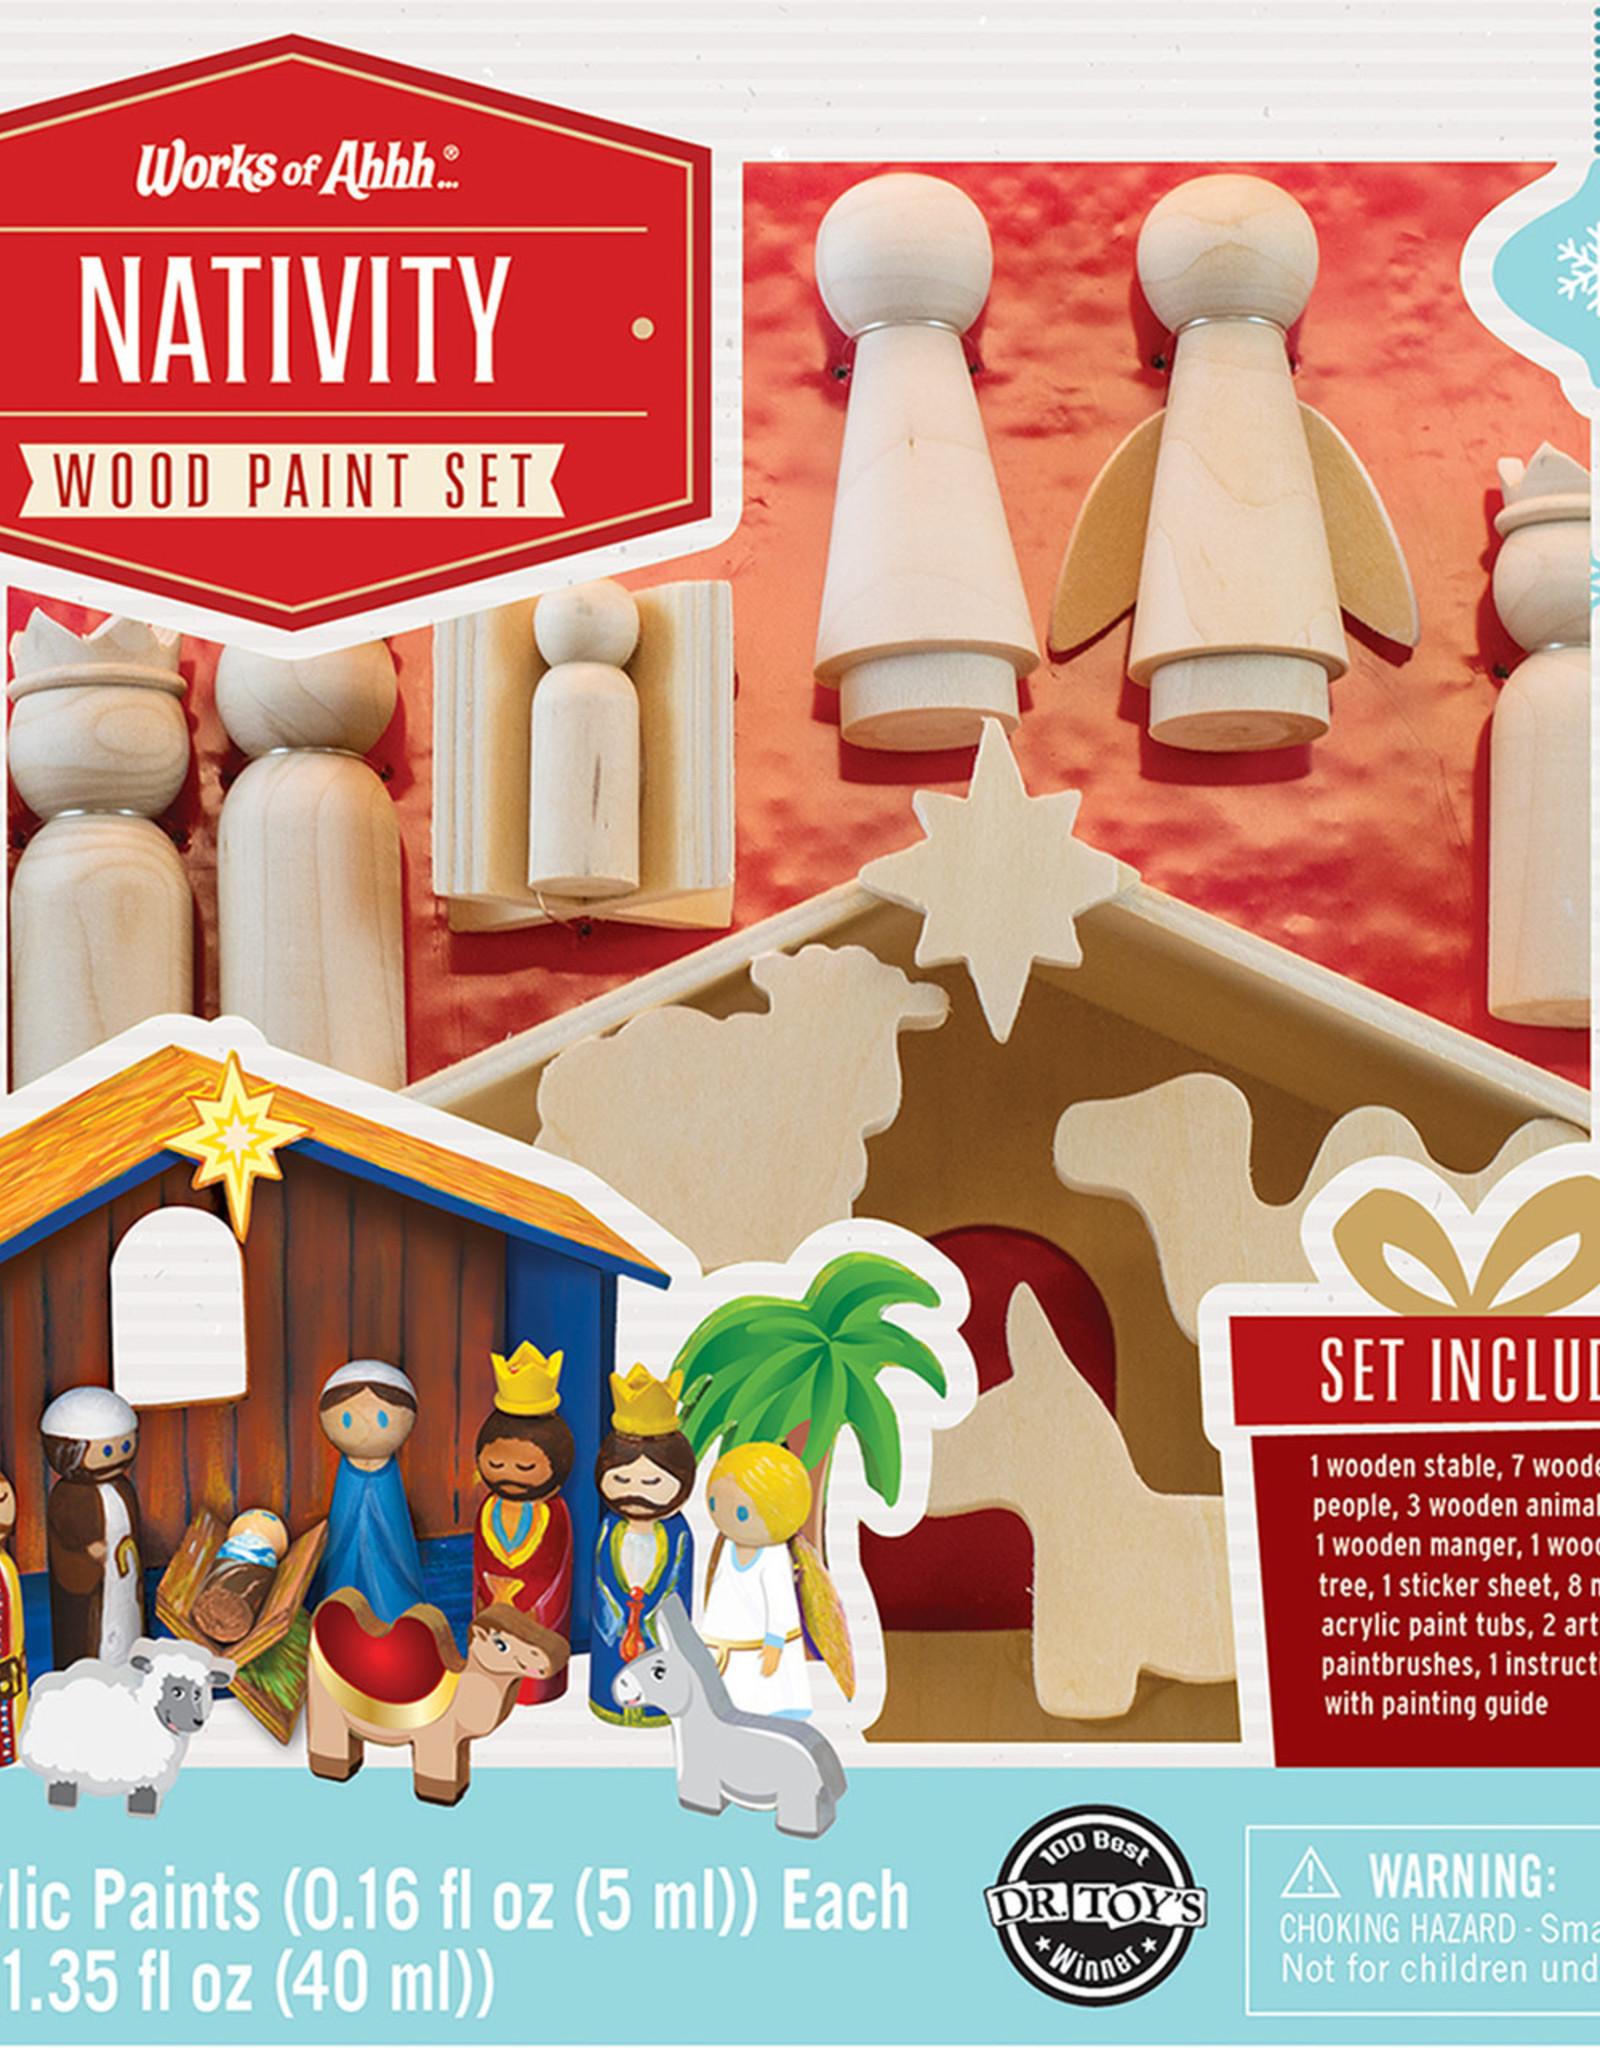 Works of Ahhh Paint Kit Nativity